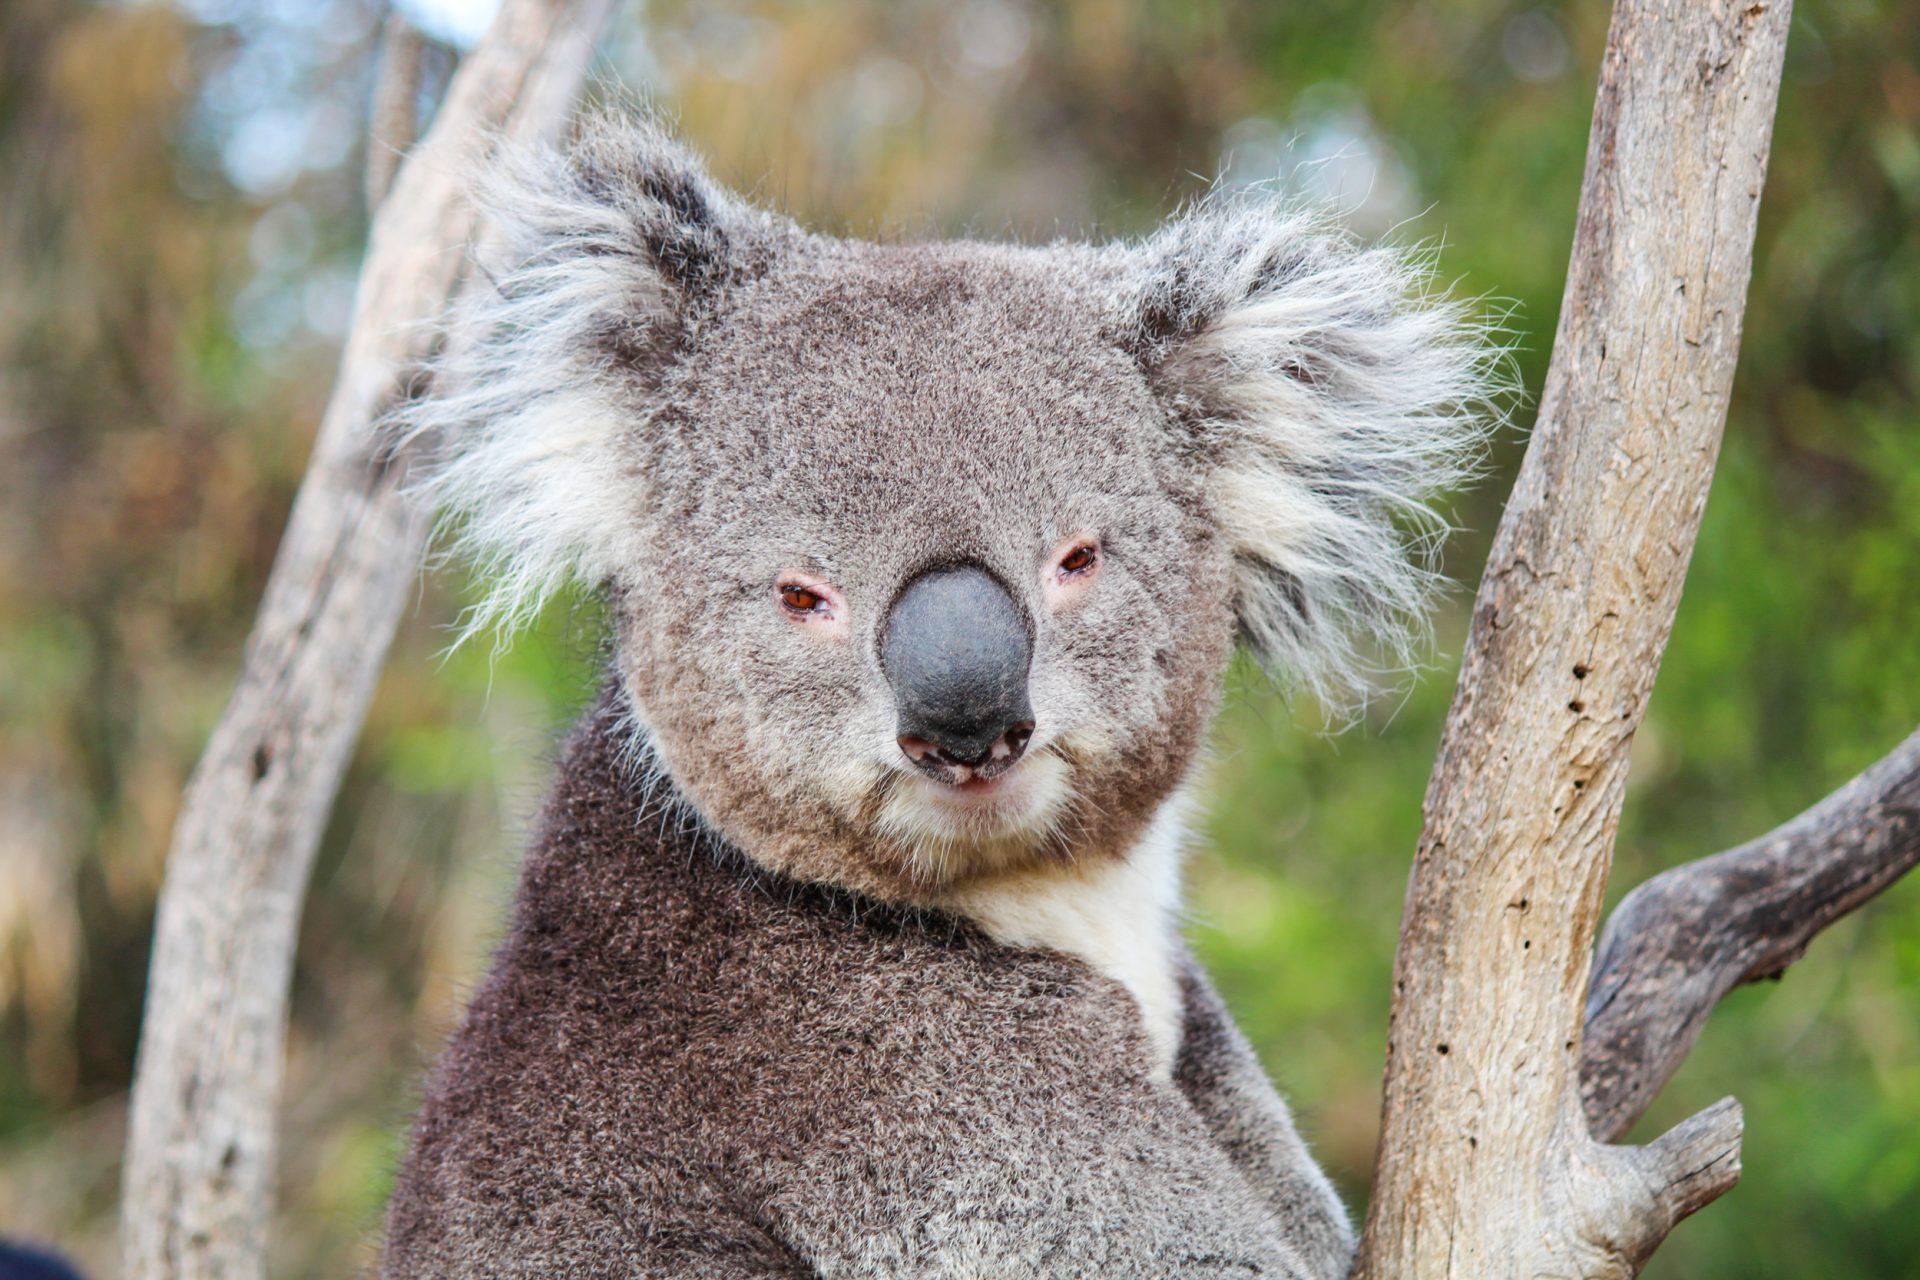 Koala at Bonorong Wildlife Sanctuary, Tasmania